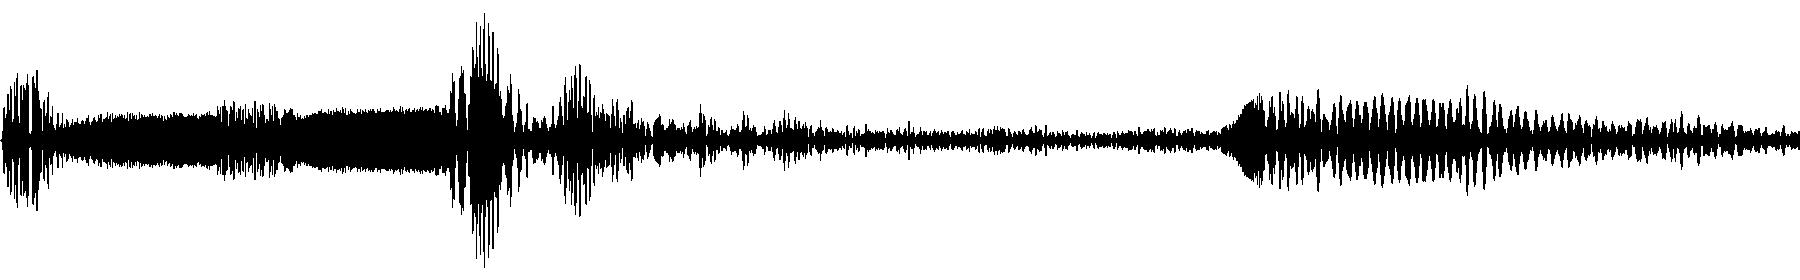 biab glitchhop blip 8